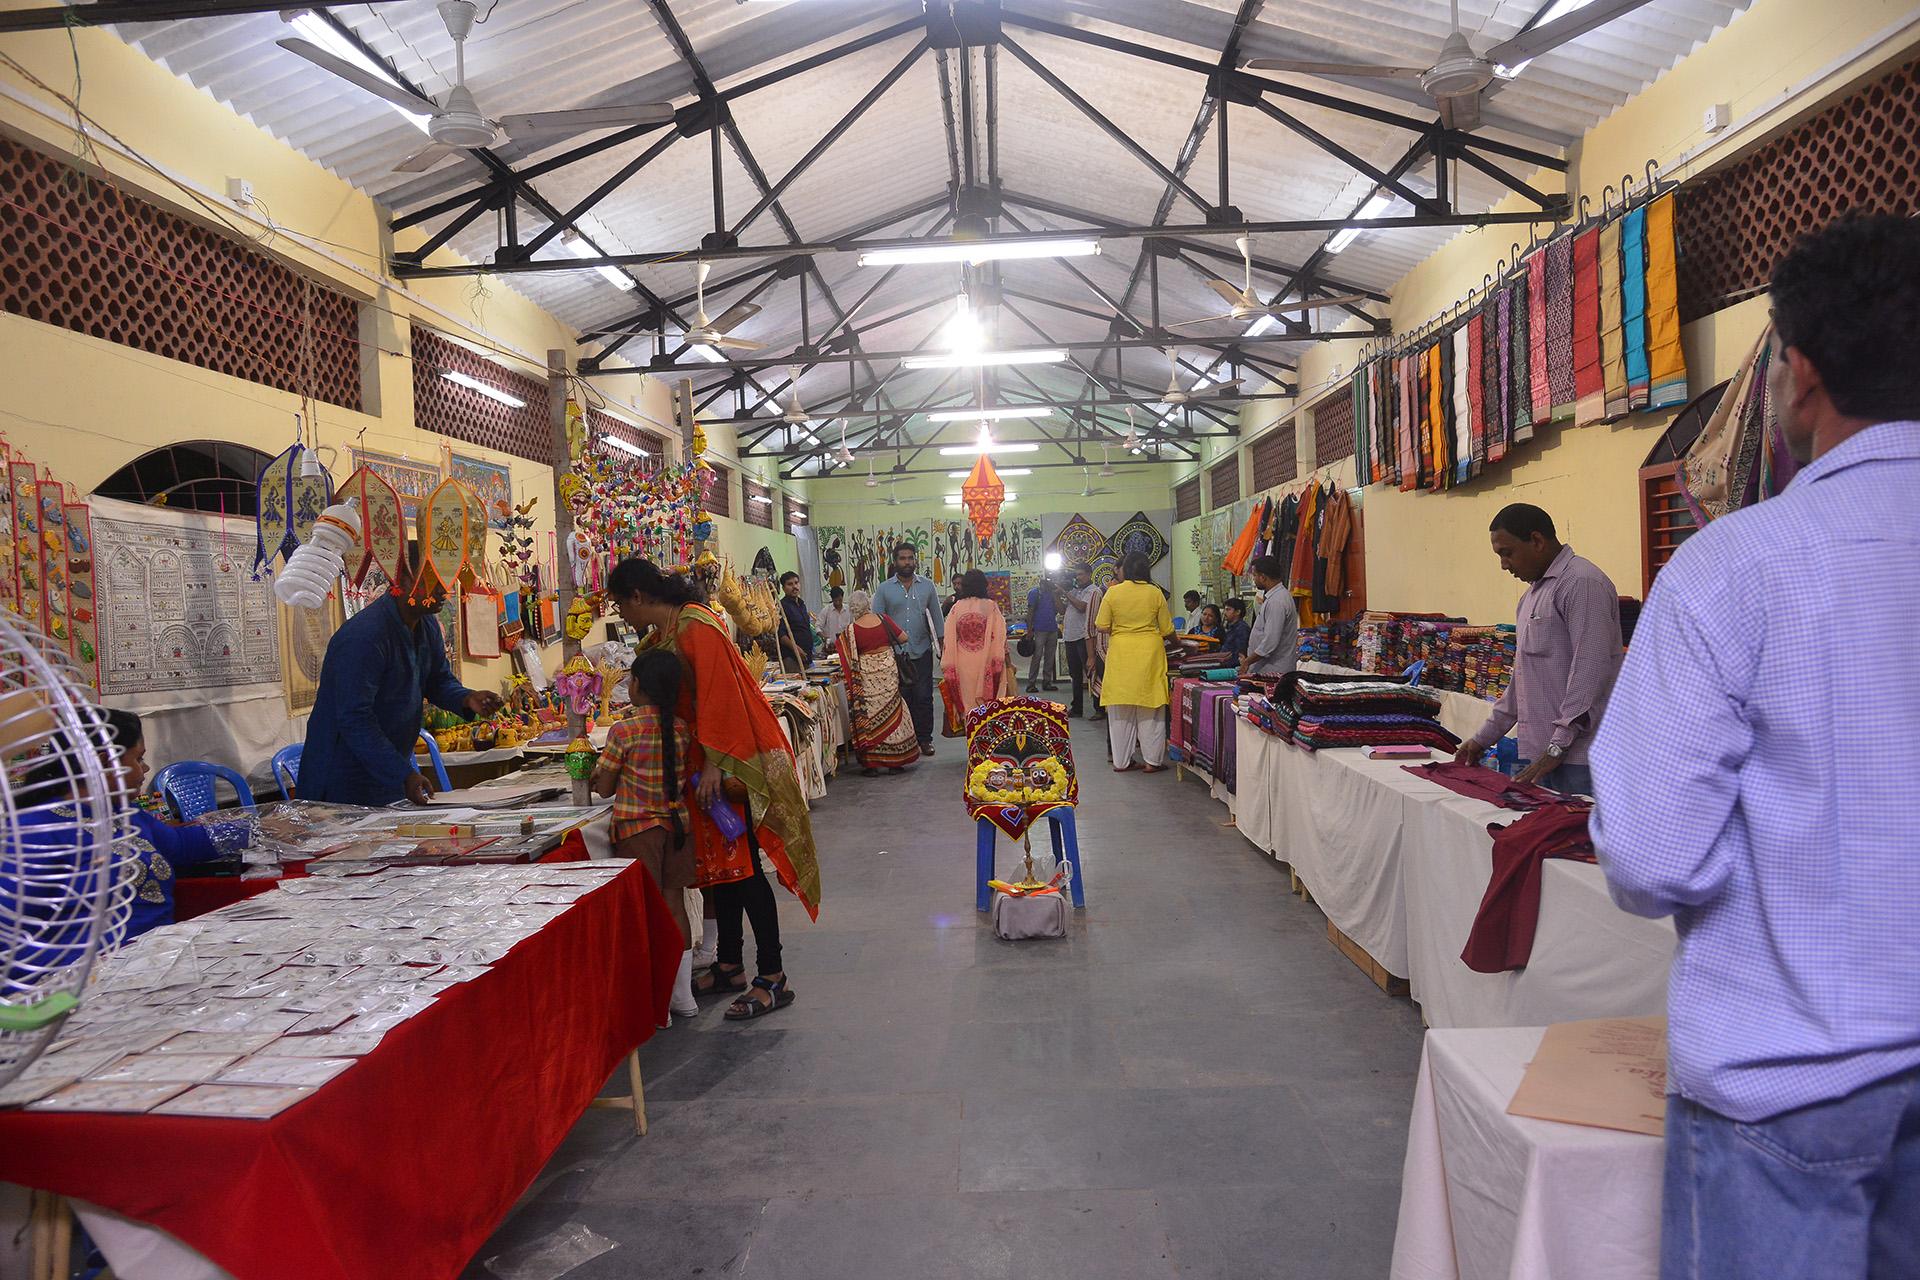 Utkalika Organizes A Unique Handloom And Handicrafts Exhibition At